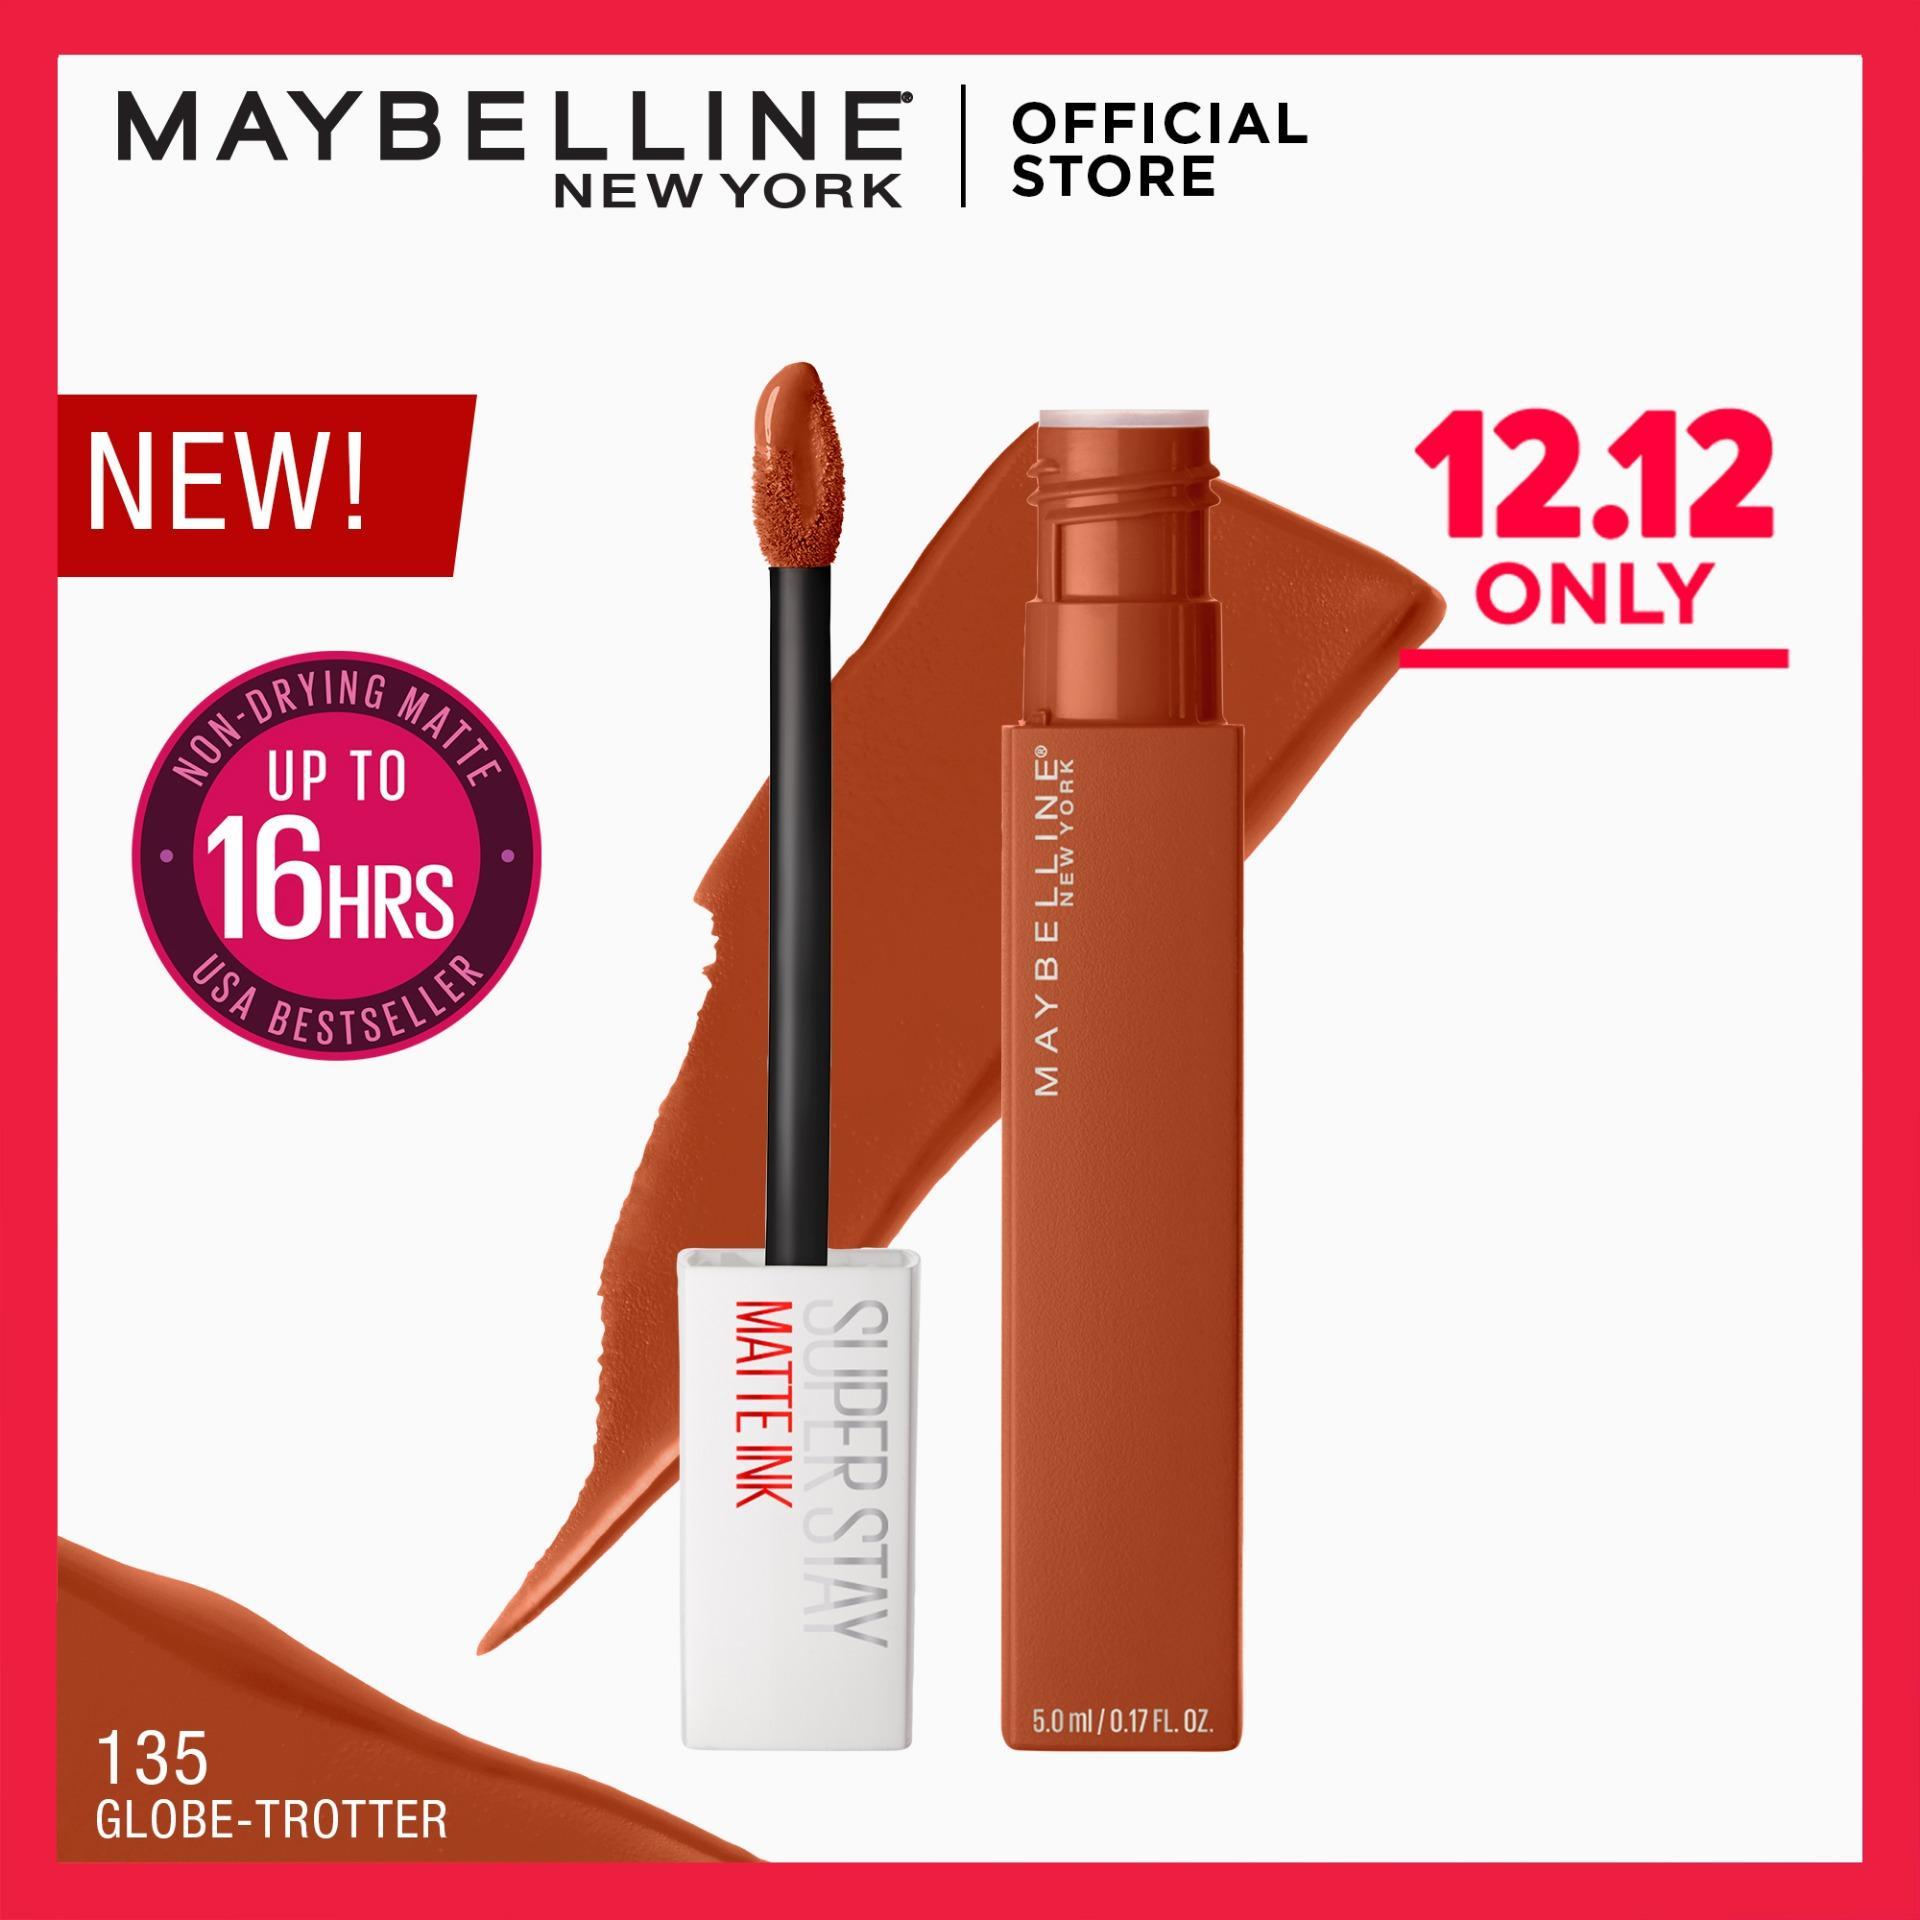 Makeup Brands Beauty On Sale Prices Set Reviews In R 02 Pixy Moisture Lipstick 38gr Liquid Lipsticks